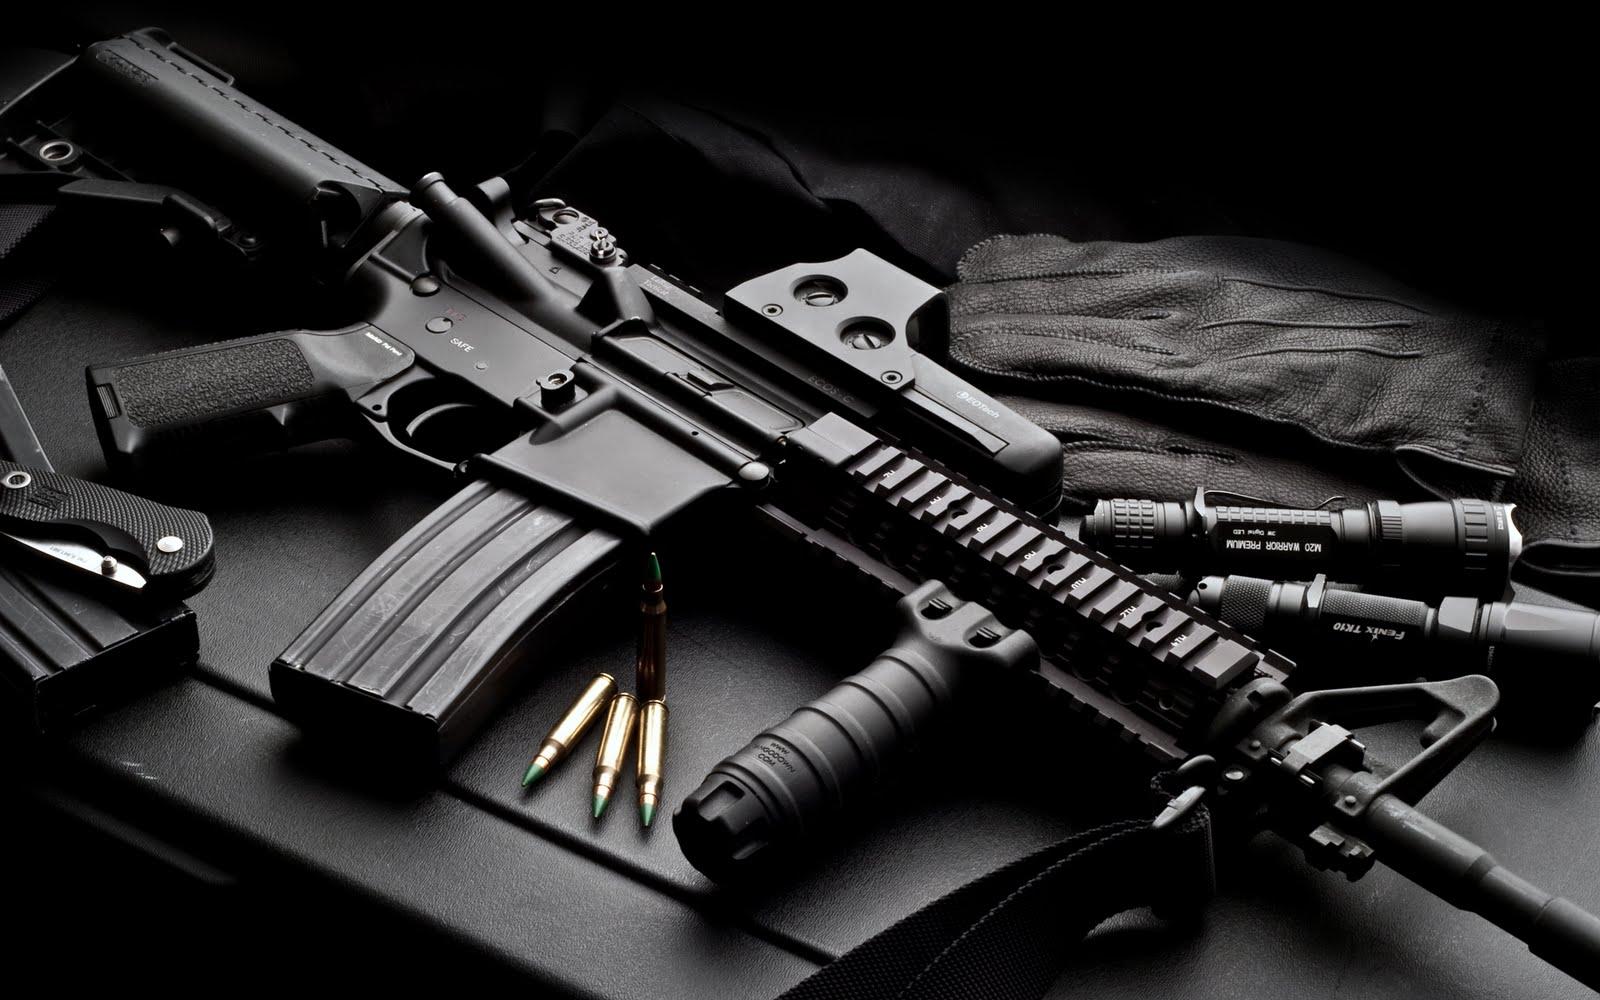 gun wallpaper cool gun wallpaper cool gun wallpaper machine gun 1600x1000